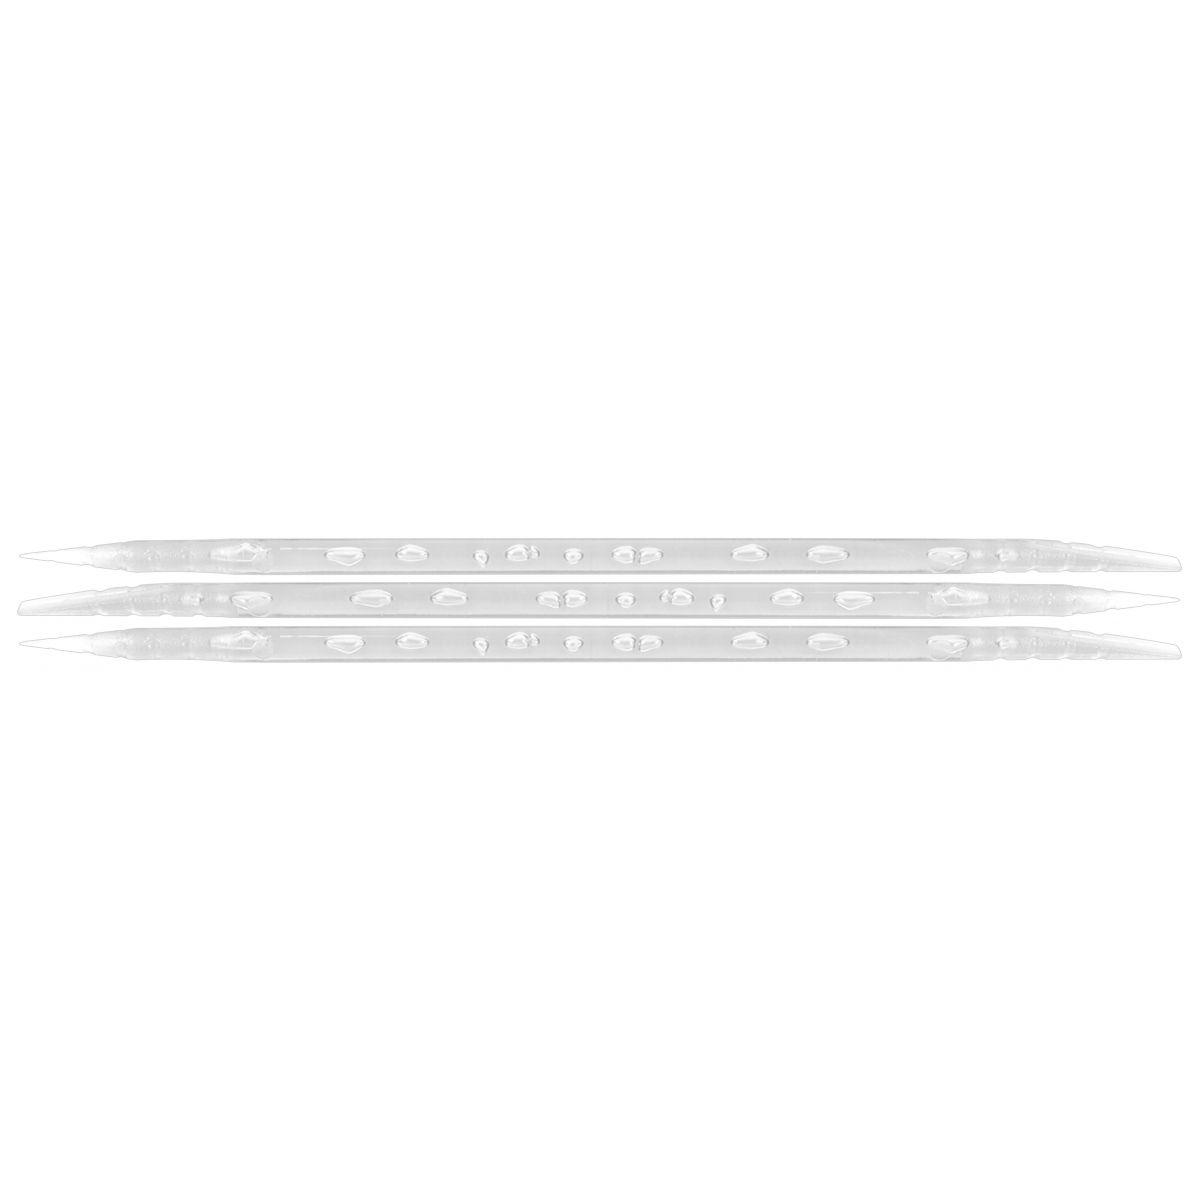 Palito Plástico Transparente Para Manicure Descartável 100 Unidades